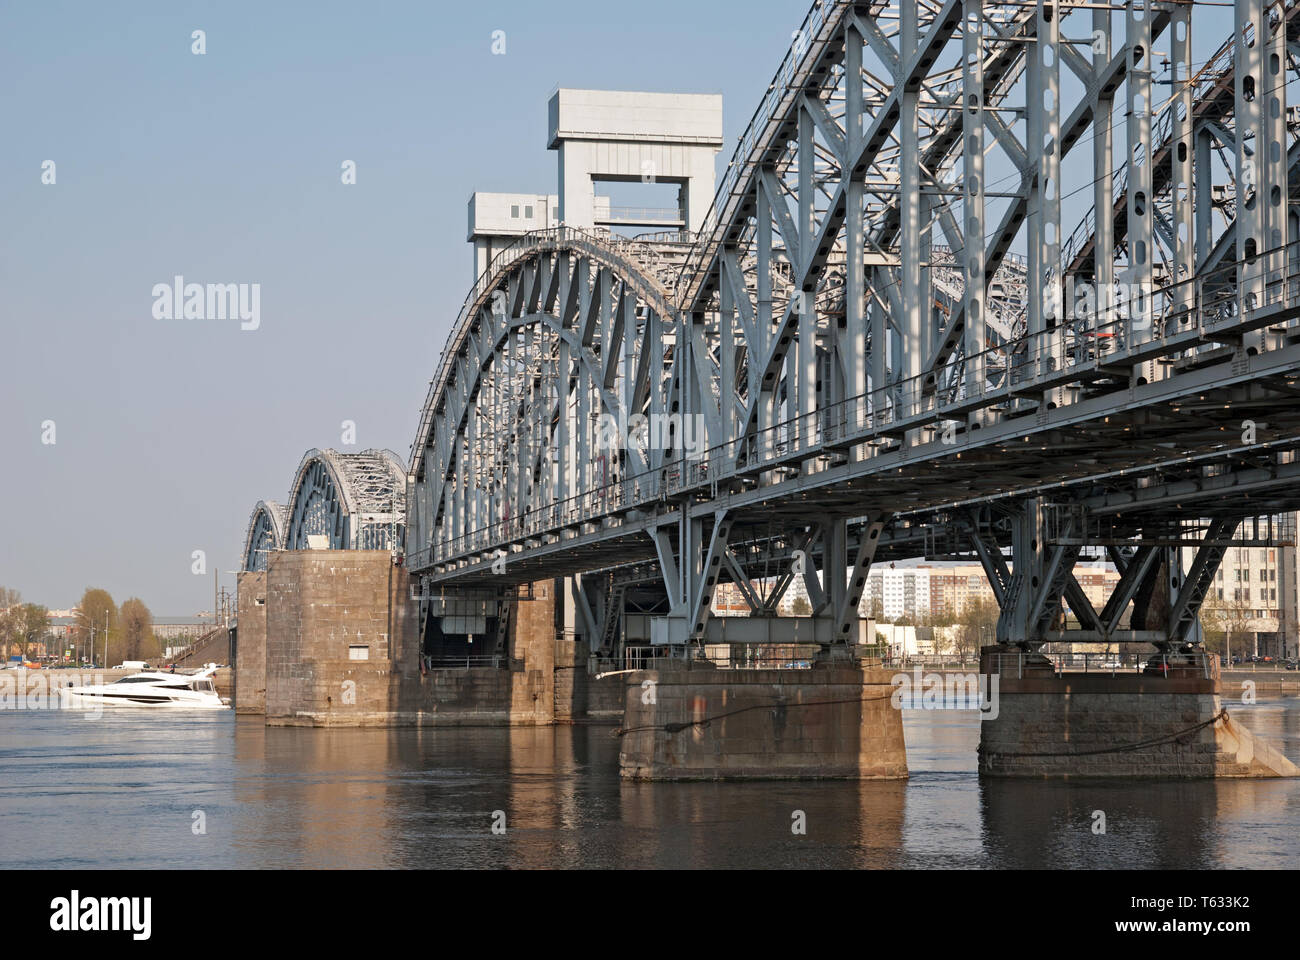 SAINT - PETERSBURG, RUSSIA – APRIL 26, 2019: Small white boat on The Neva River near The Finland Raiway Bridge in St Petersburg Stock Photo